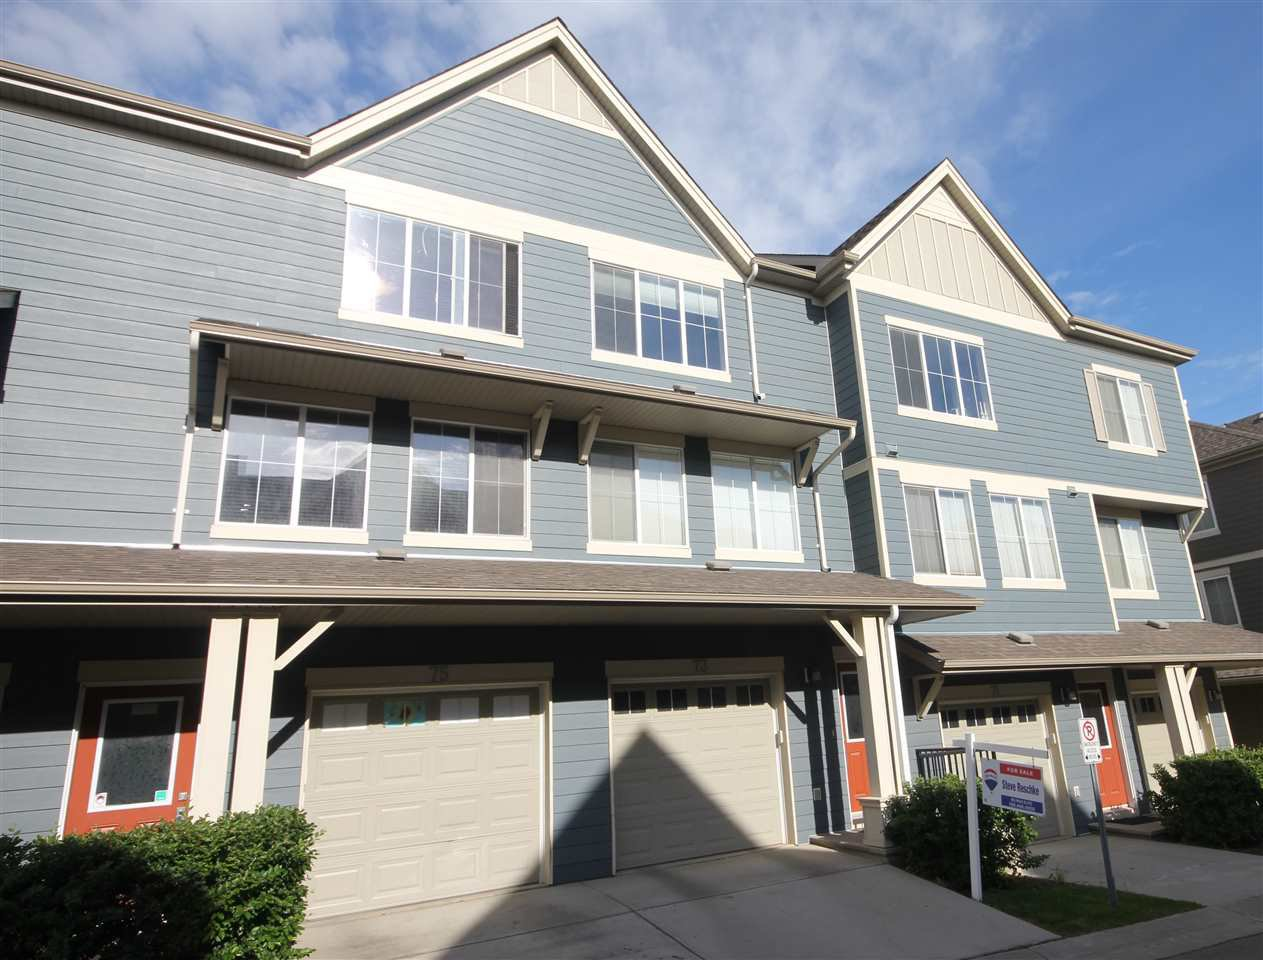 Main Photo: 73 603 WATT Boulevard in Edmonton: Zone 53 Townhouse for sale : MLS®# E4159843